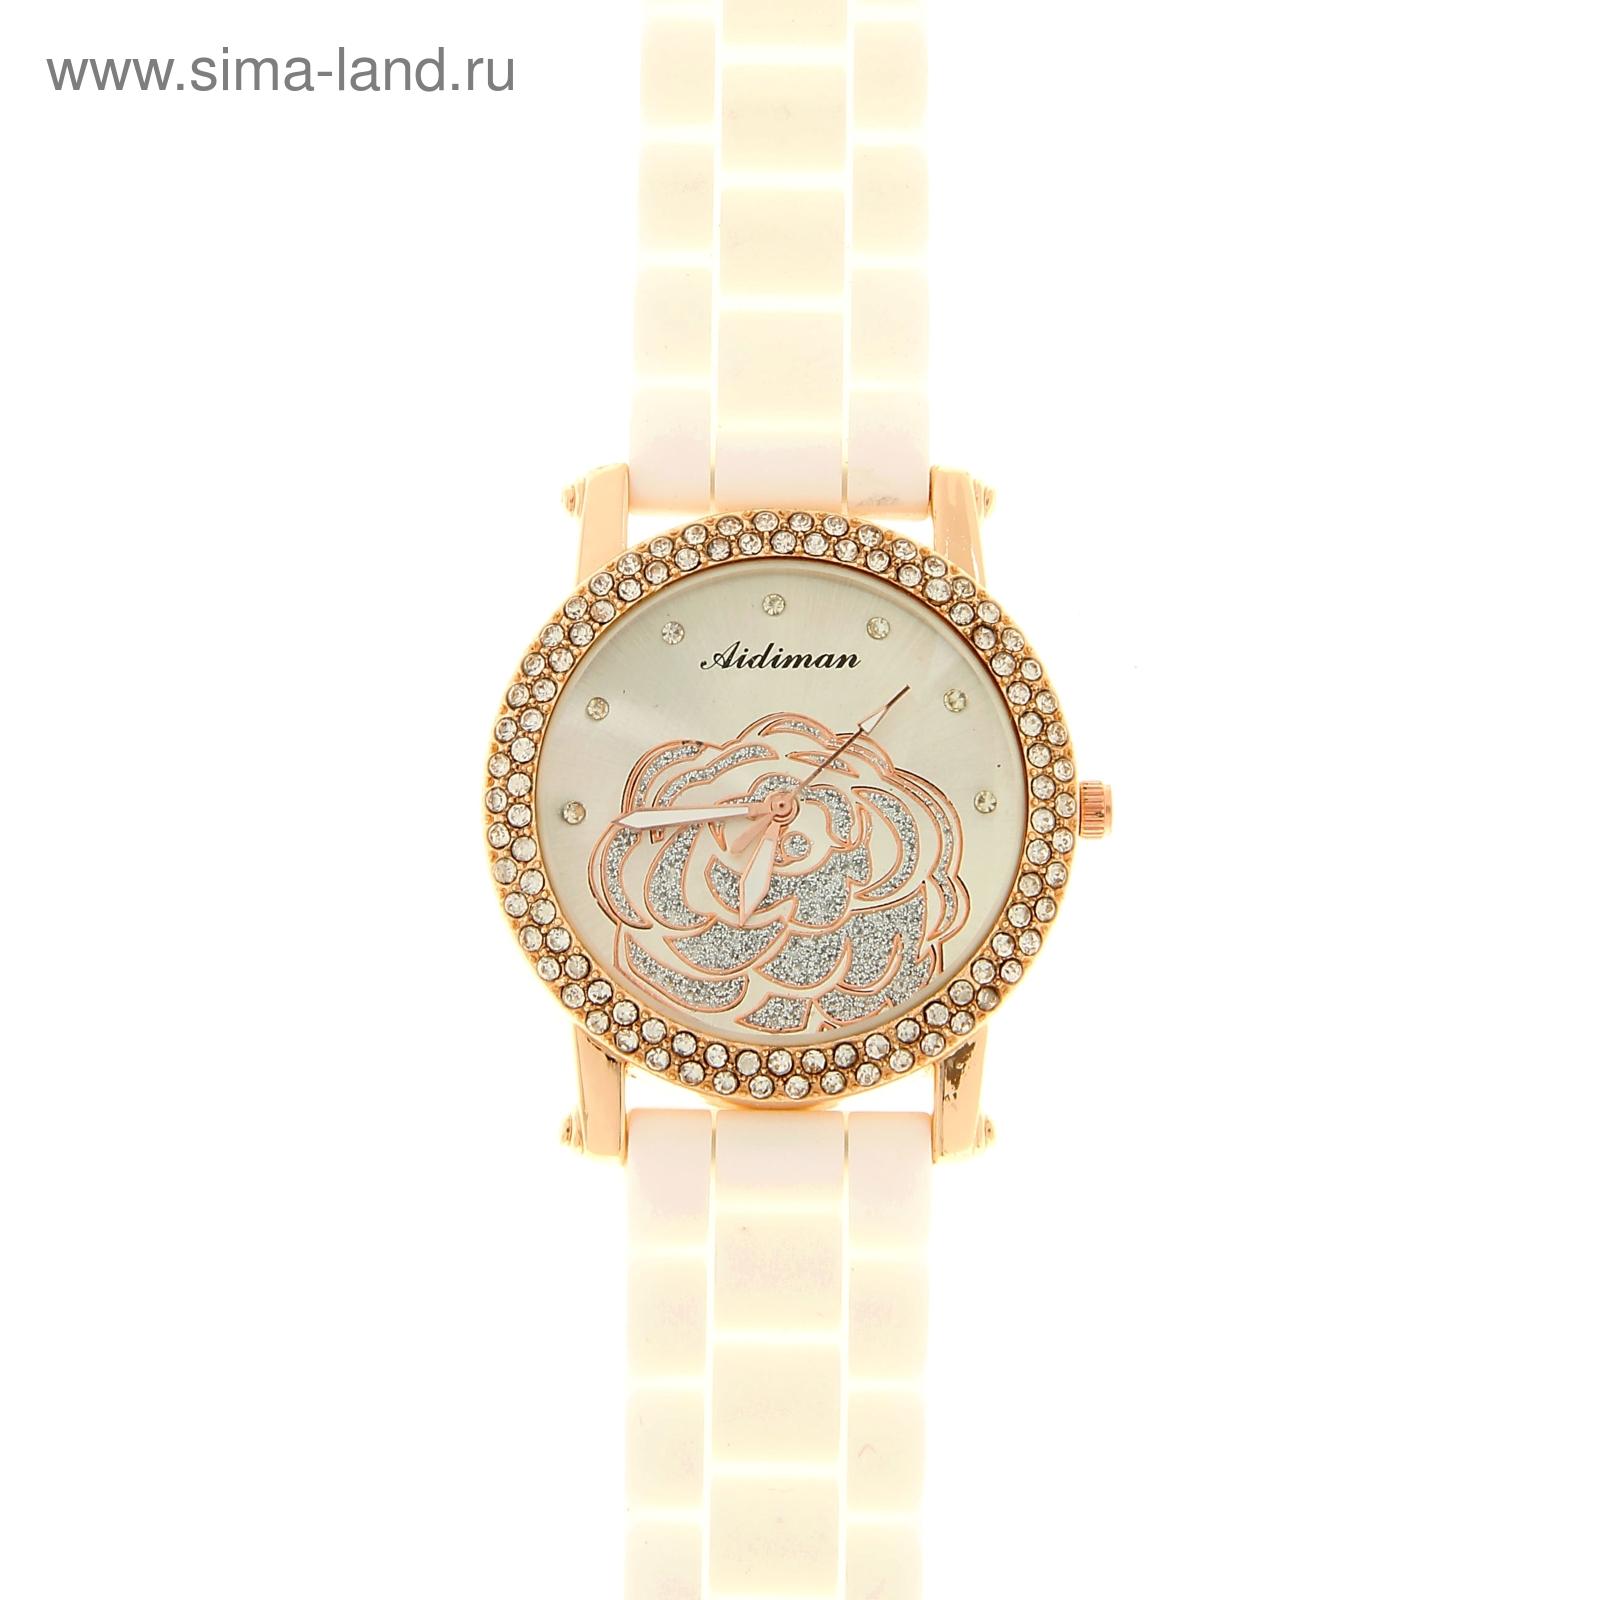 95f02aae060a Часы наручные женские